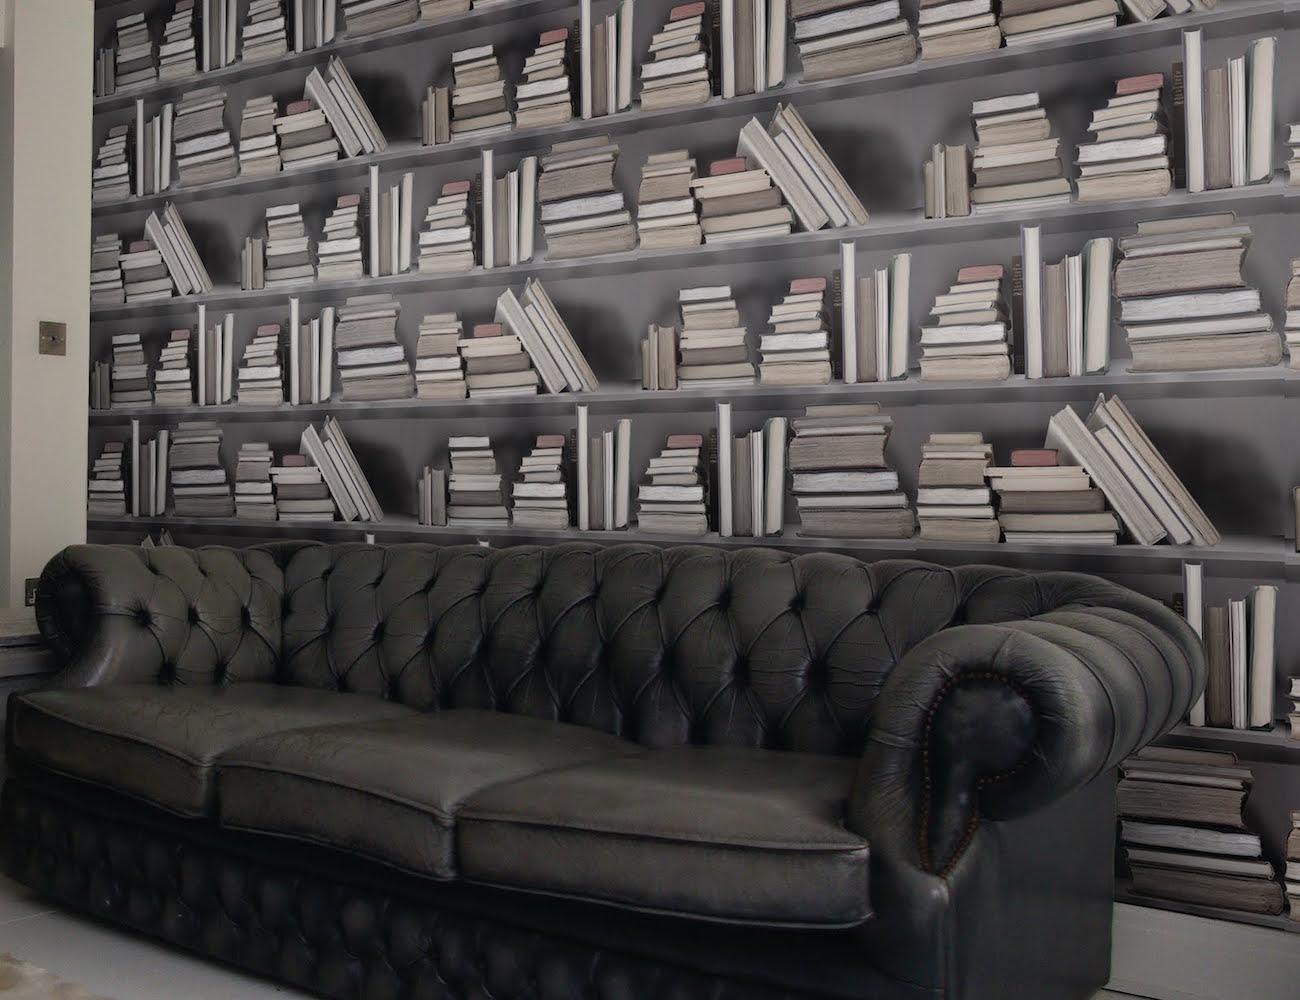 Vintage Bookshelf Wallpaper Gadget Flow